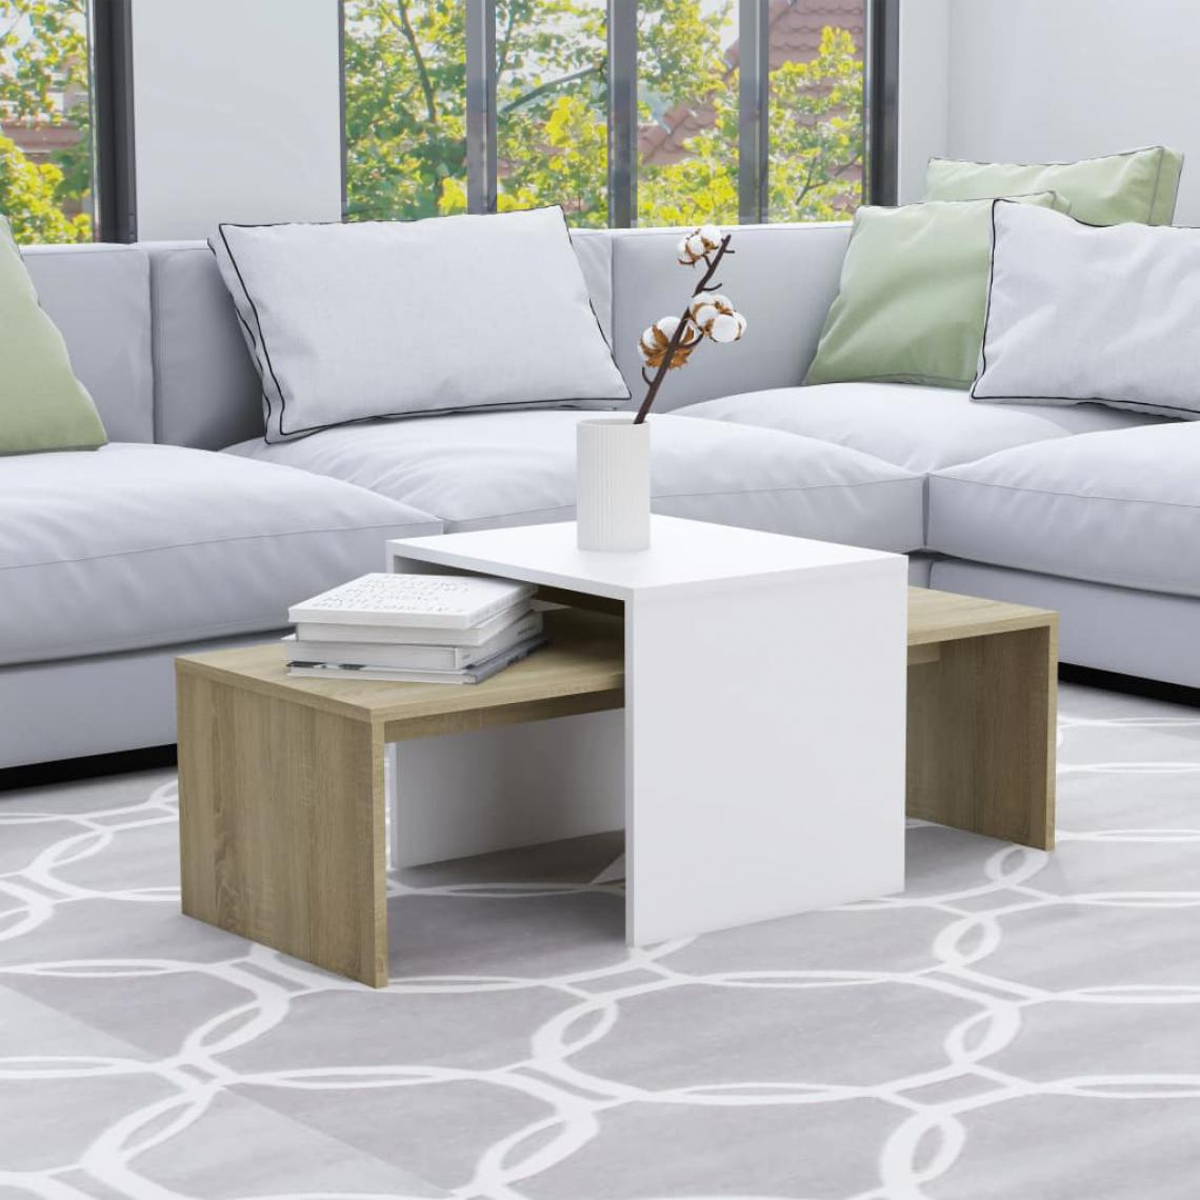 Vidaxl vidaXL Jeu de tables basses Blanc chêne sonoma 100x48x40 cm Aggloméré